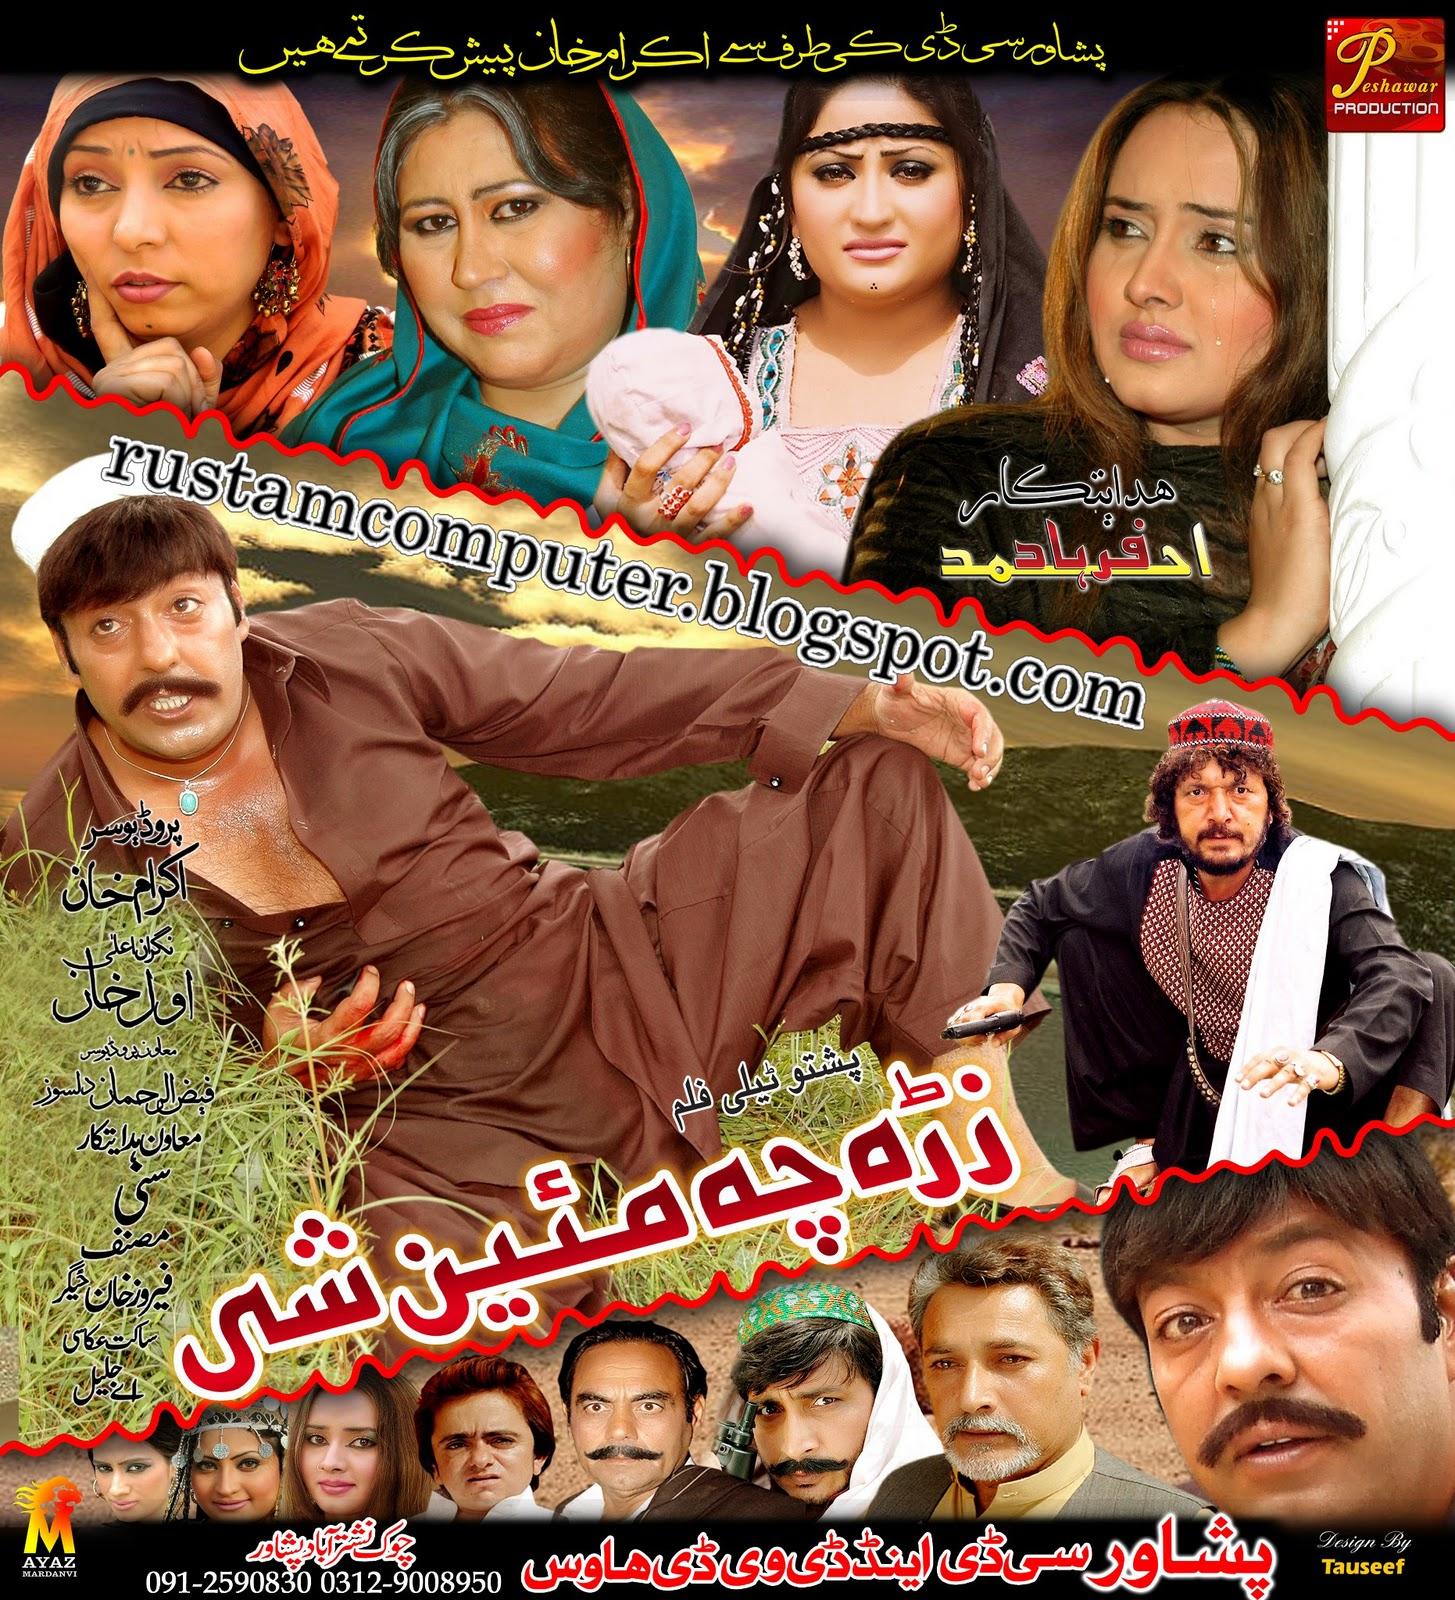 Welcome To Rustam Computer: Pashto Tele Film ZARA CI MAIN SHE